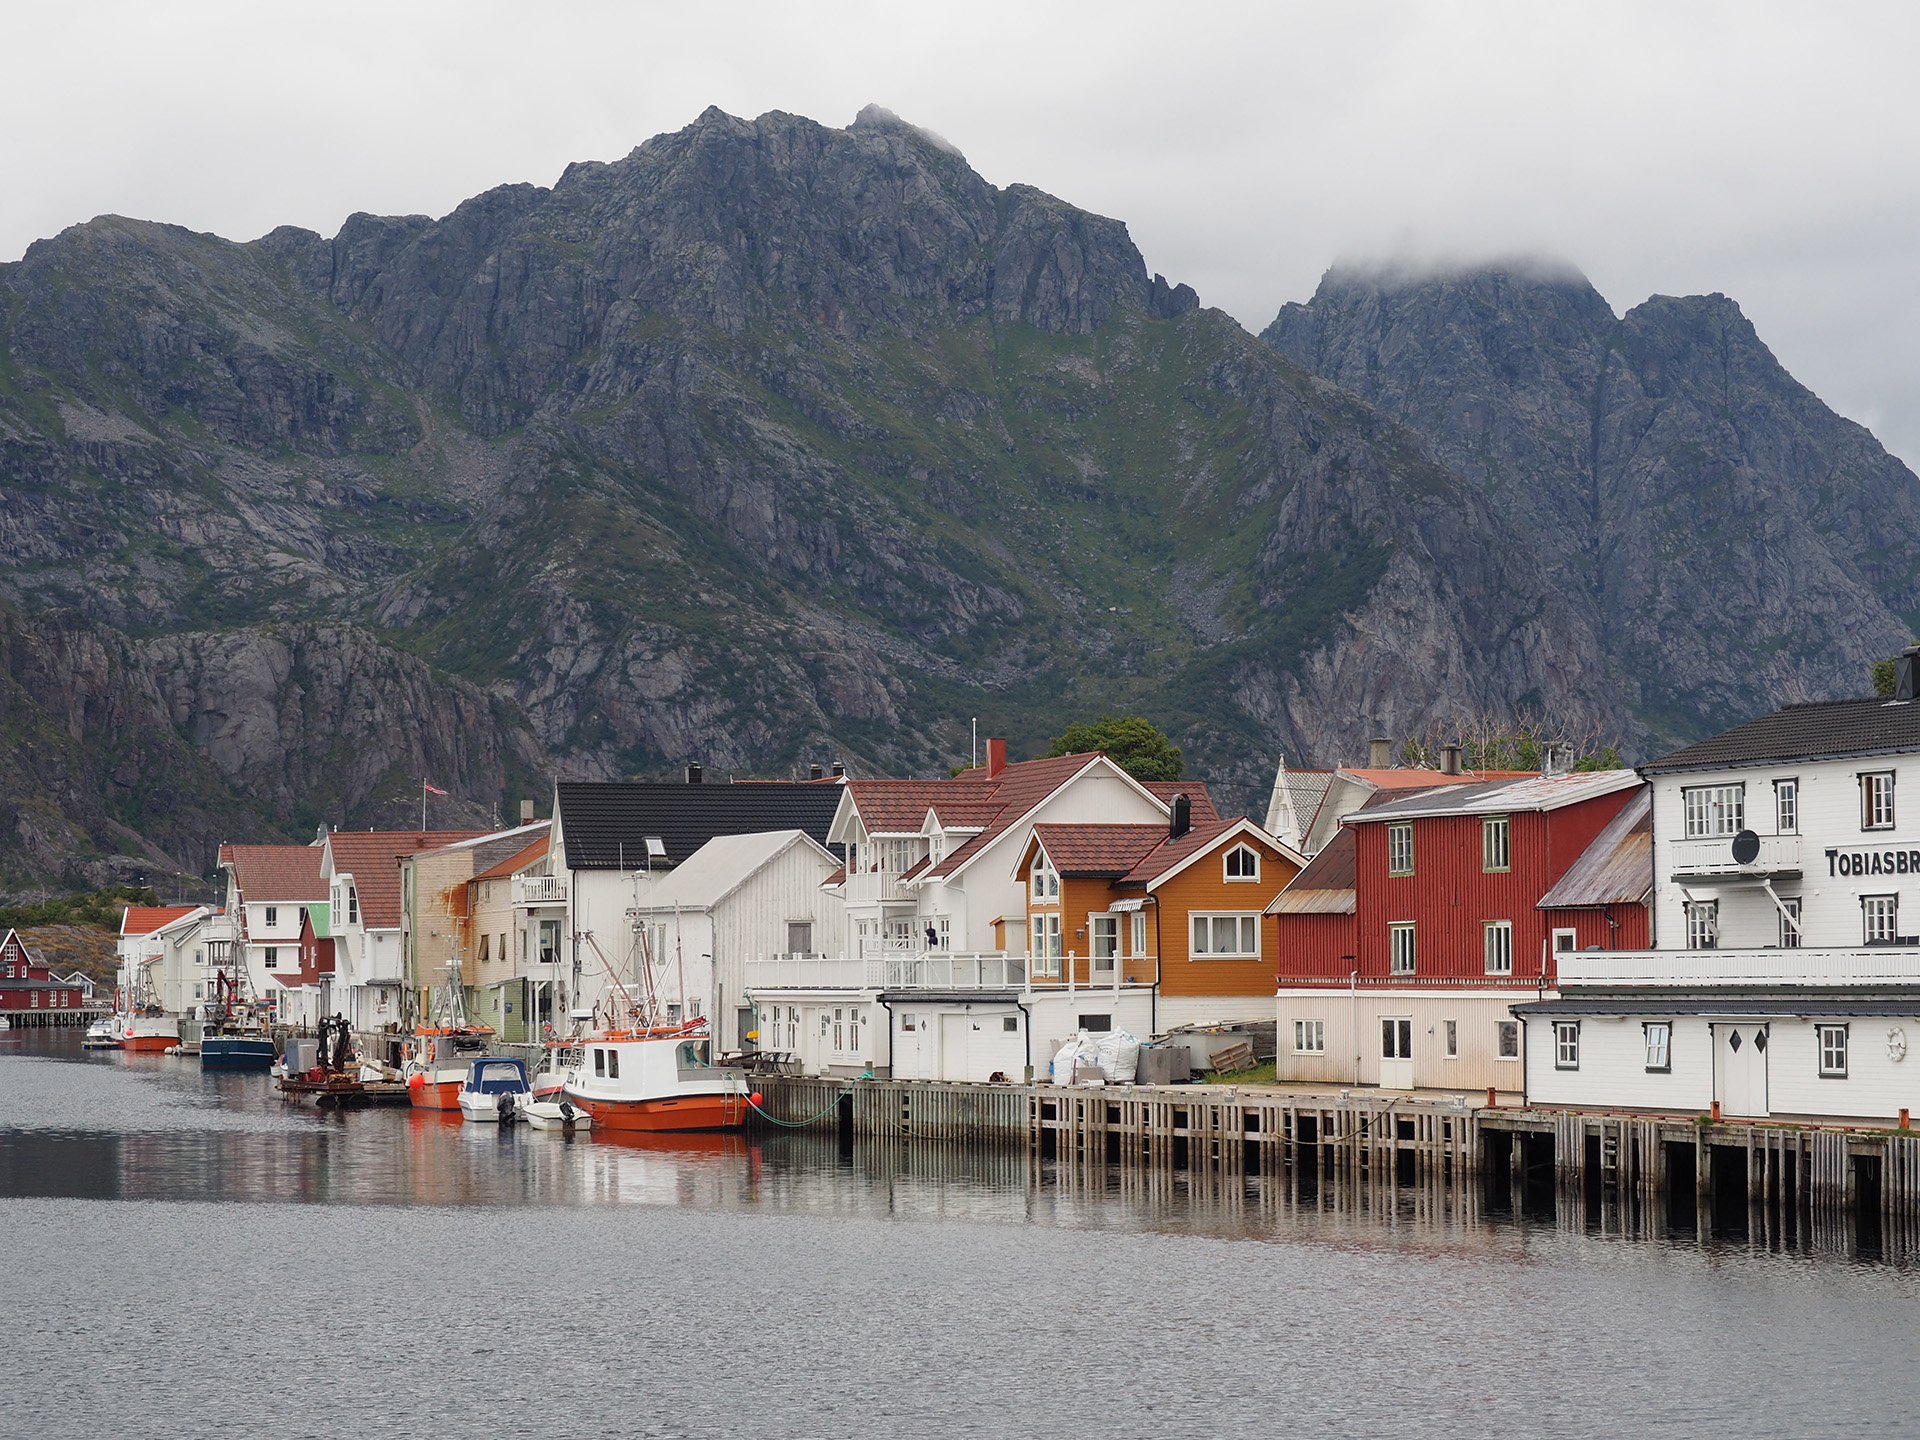 Bilde av bryggen i Henningsvær. Foto av Siri Wolland, Riksantikvaren